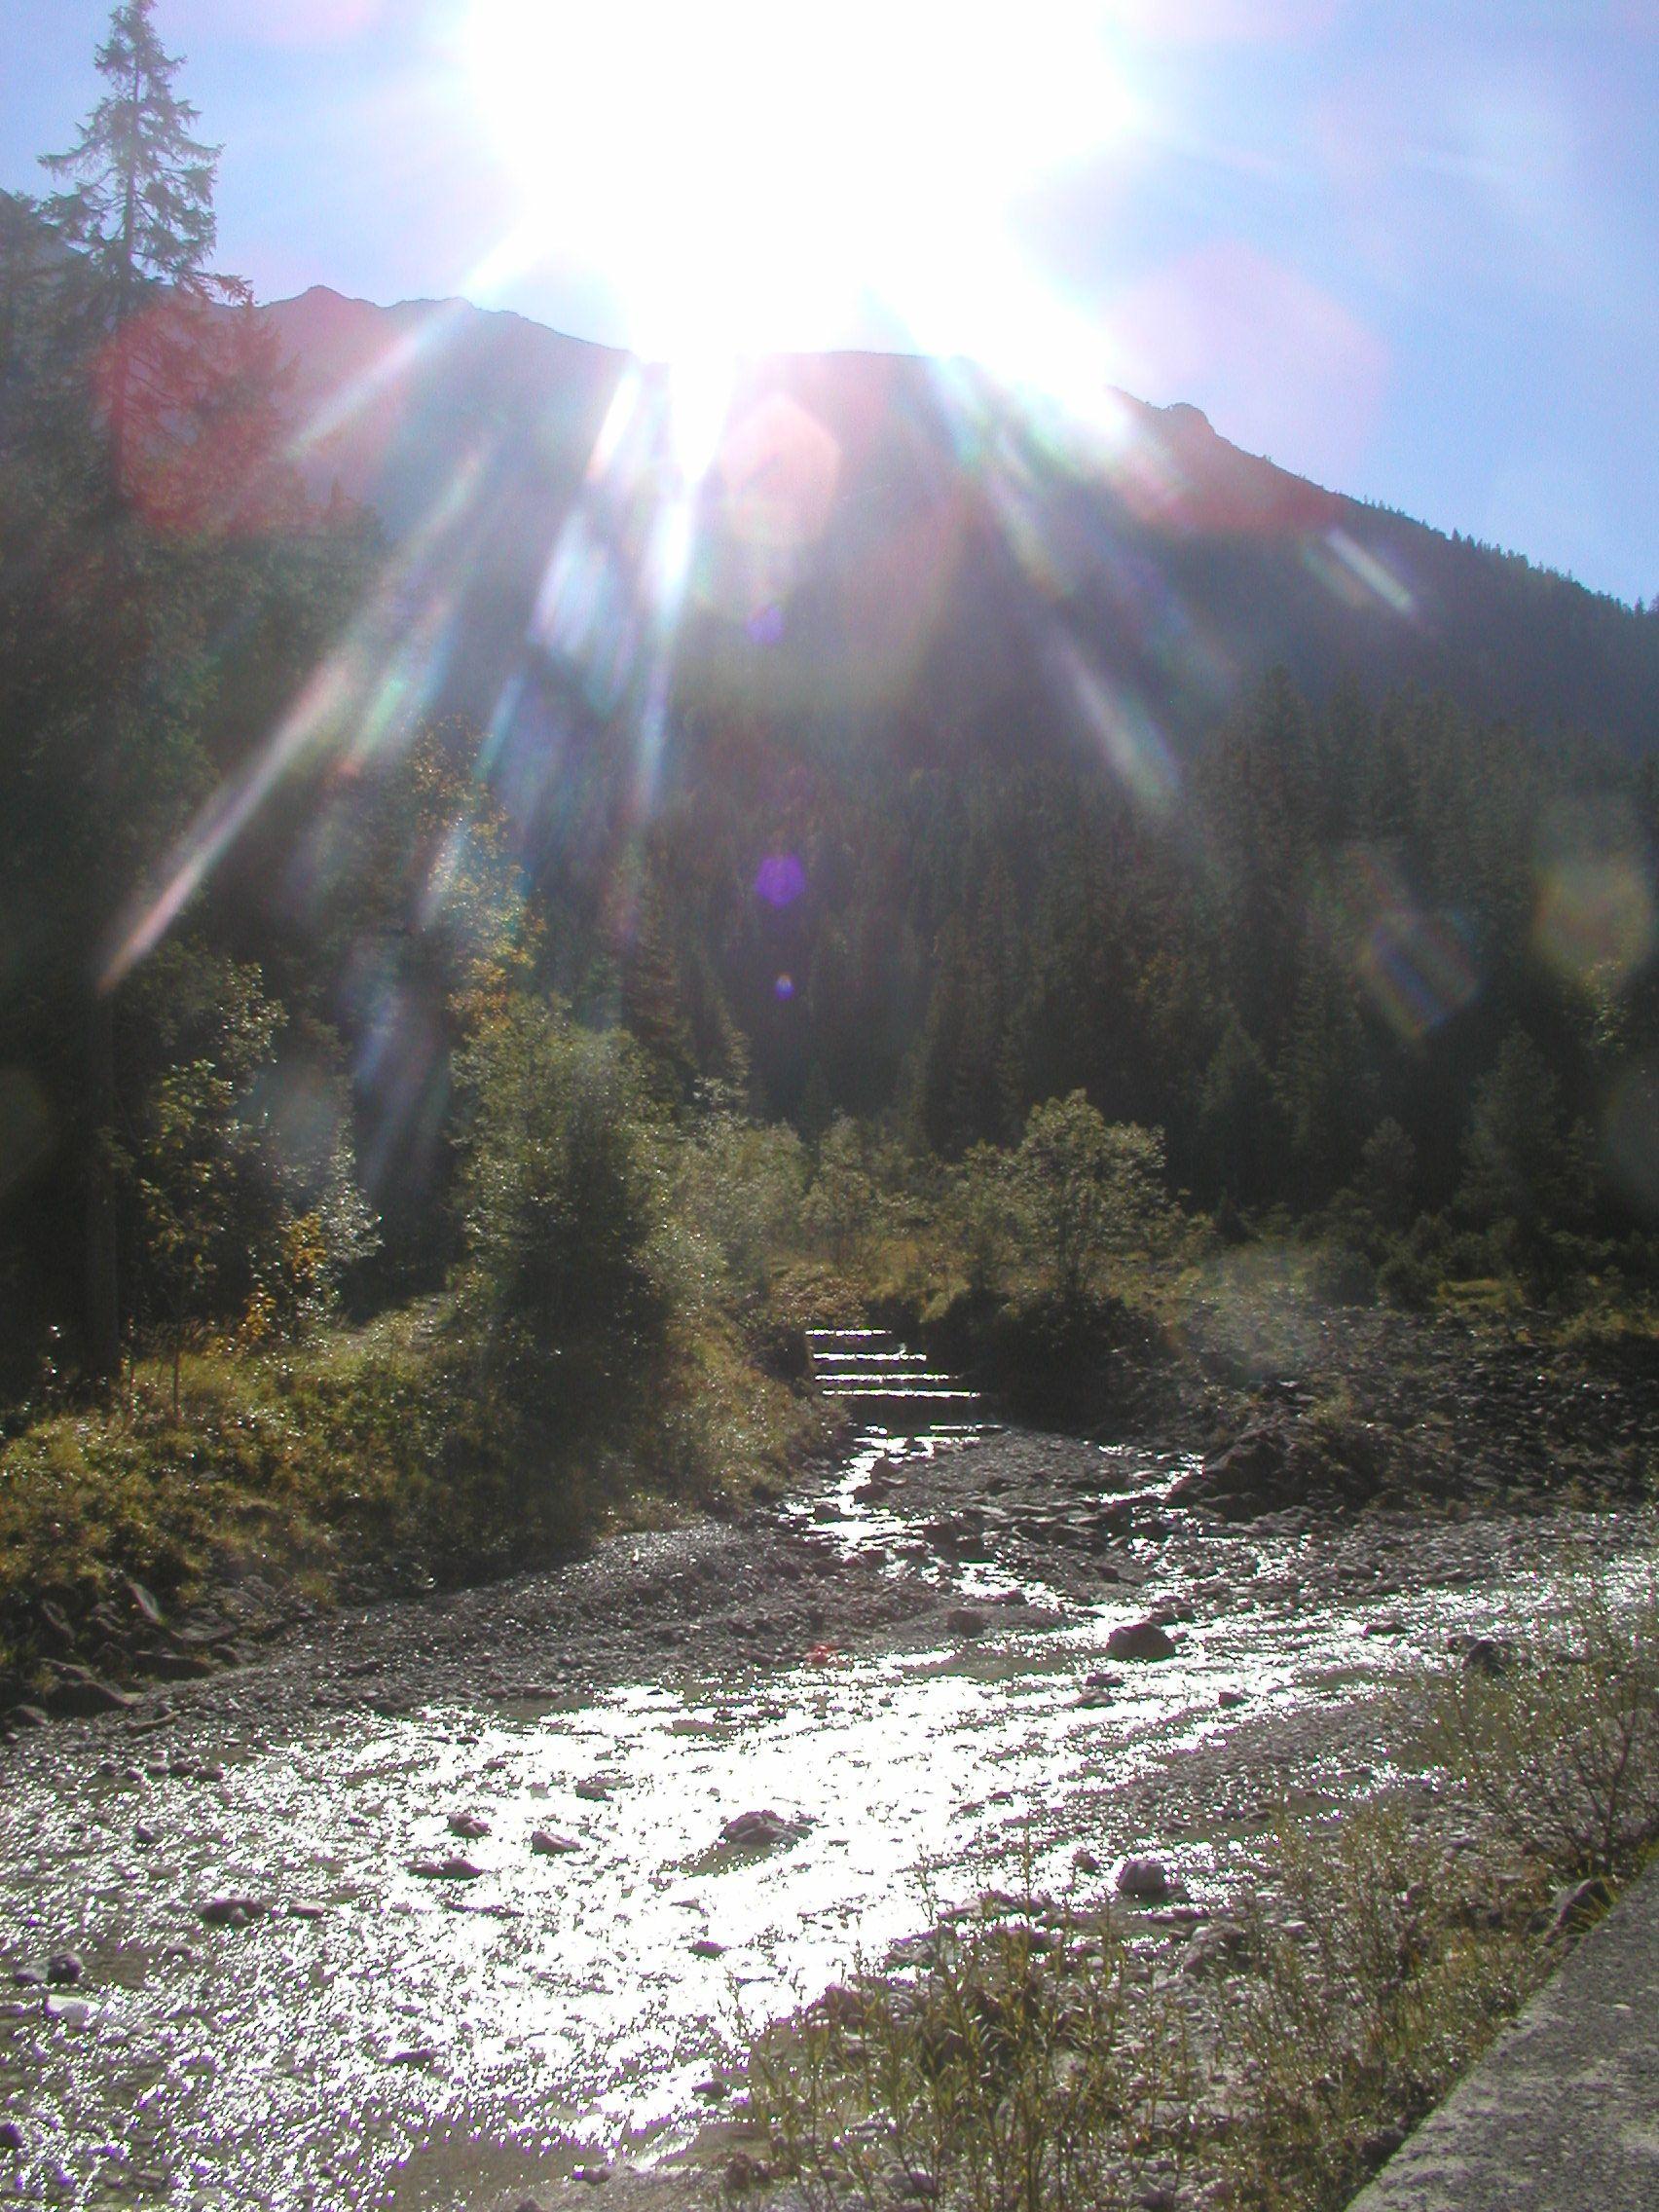 Wasserfall Im Ammertal Cabrio Touren Nature Travel Mountains